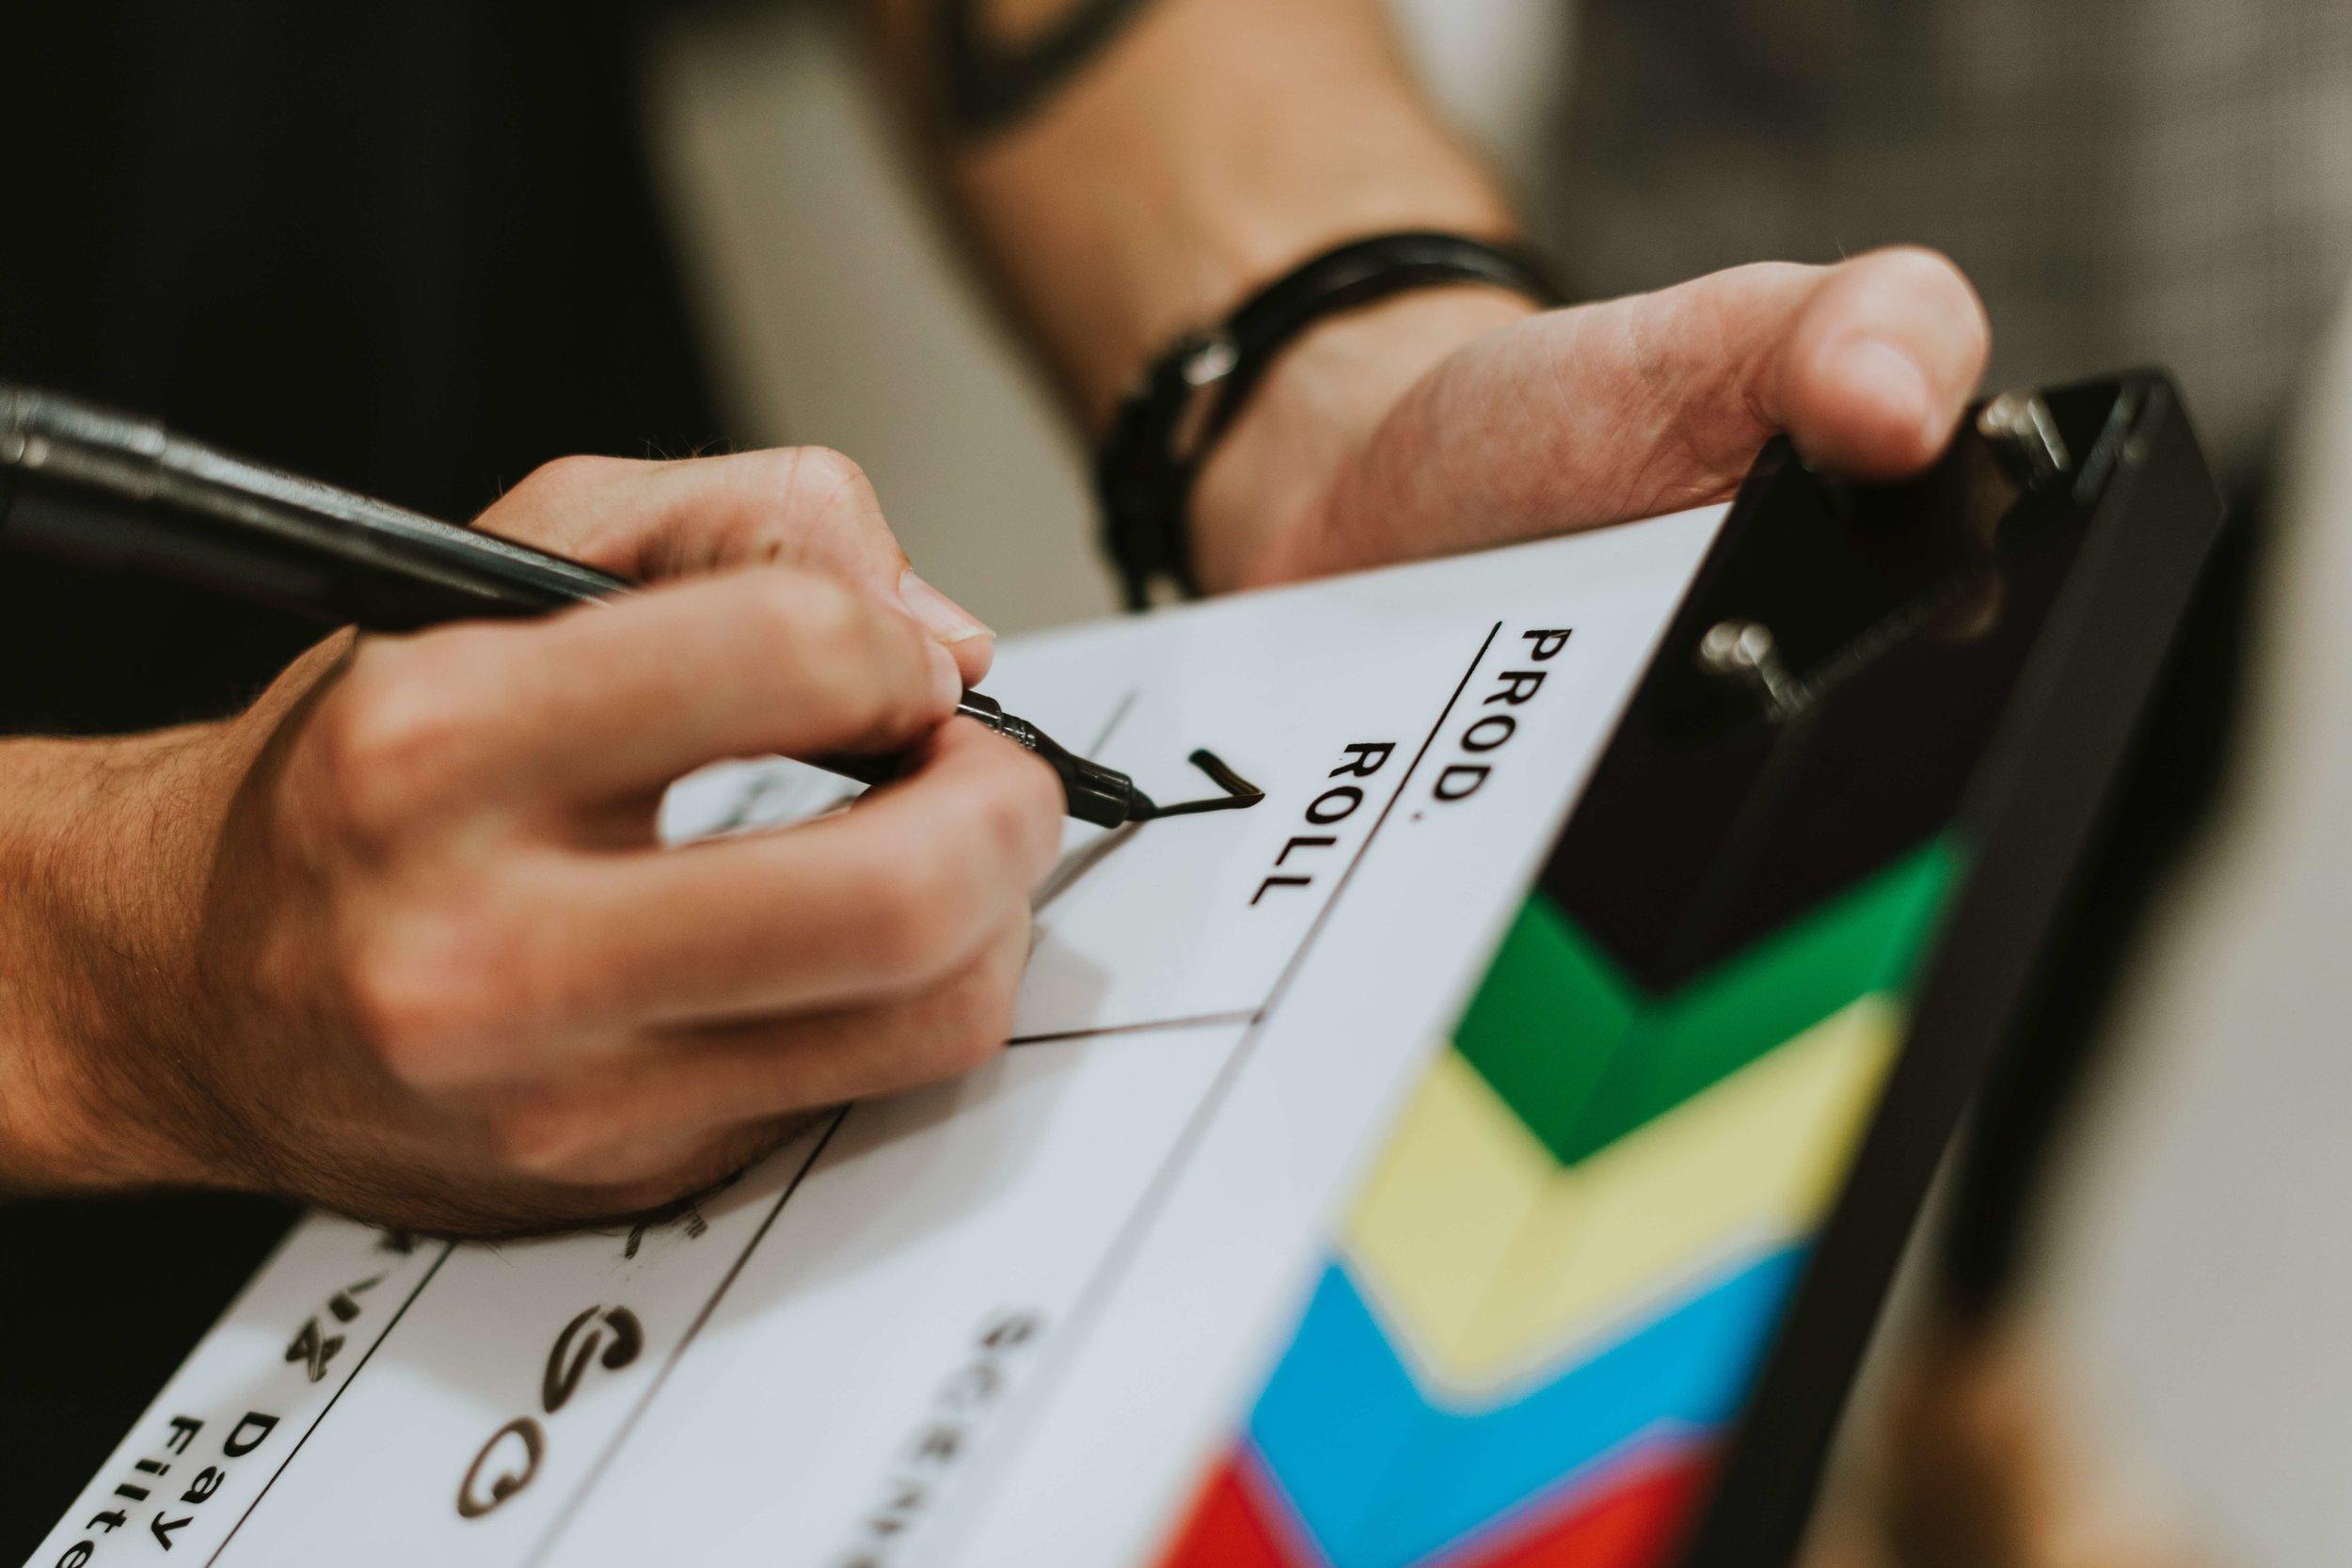 afta-music-pre-production (1).jpg